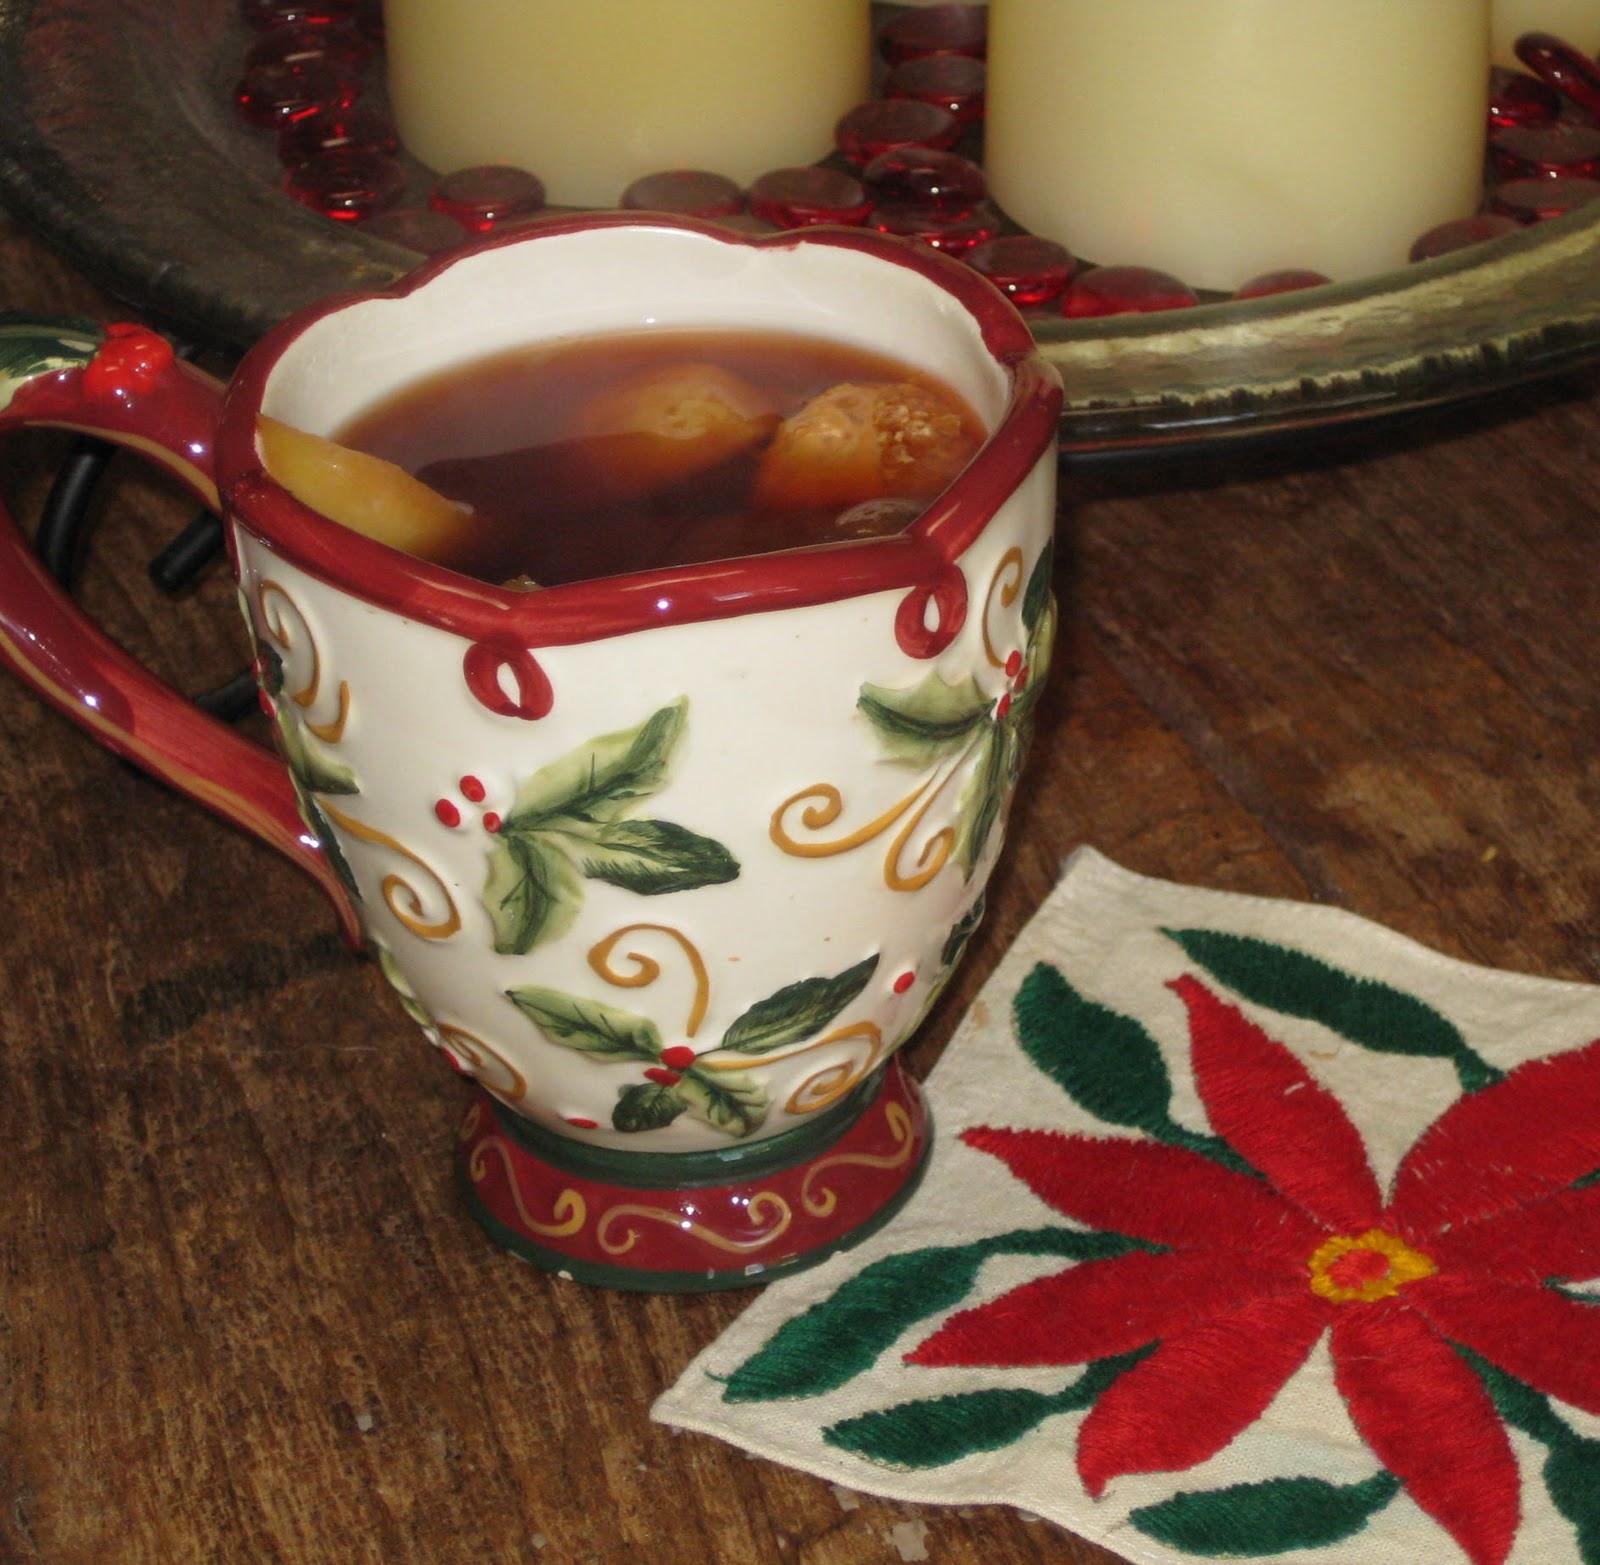 Mexican christmas food - Mexican Christmas Food 54